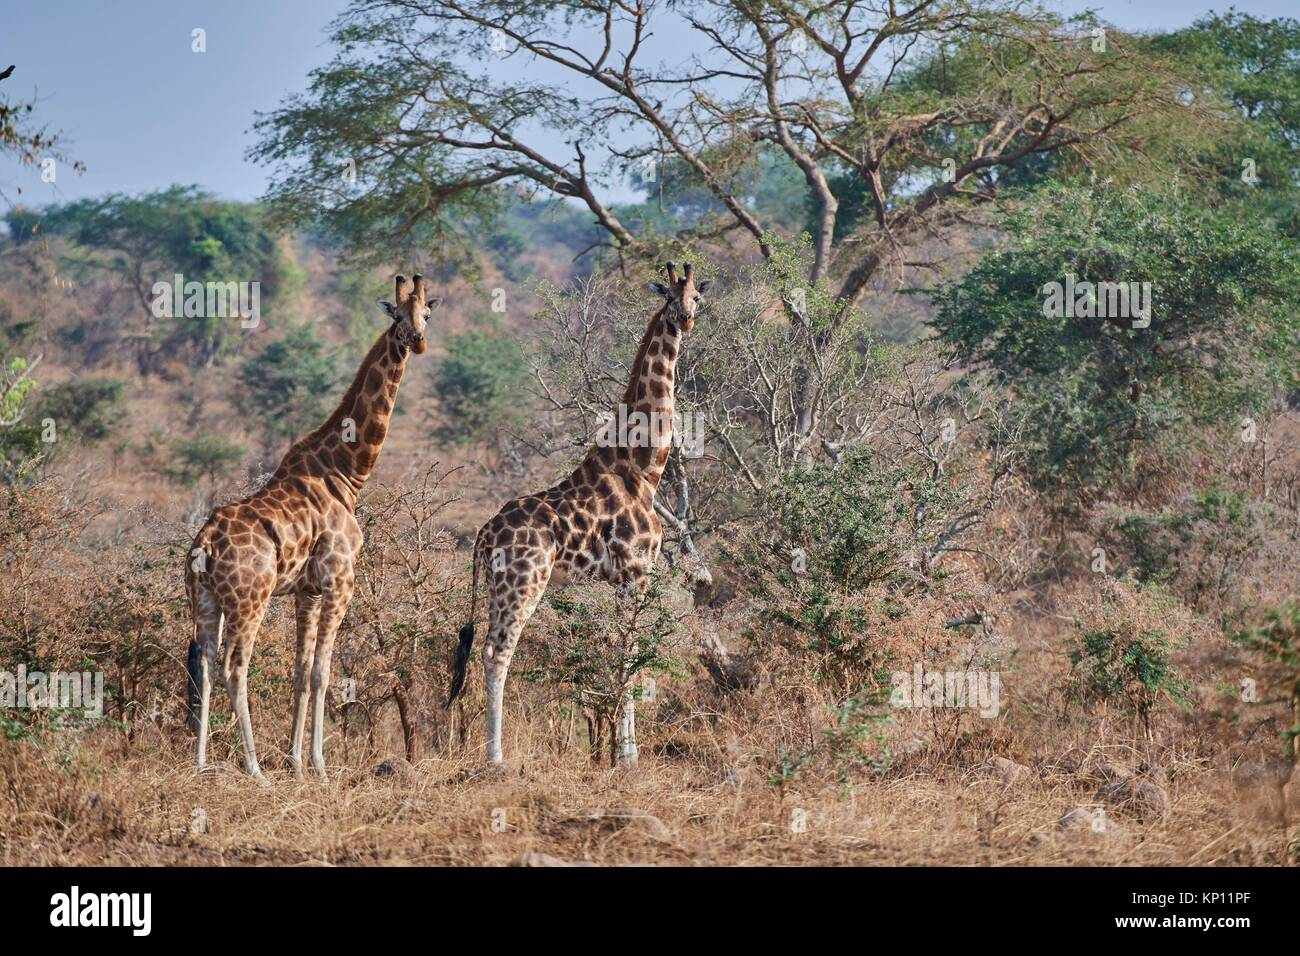 Rothschild Girafe (Giraffa camelopardalis rothschildi) dans Murchisson Falls National Park, de l'Ouganda. Photo Stock